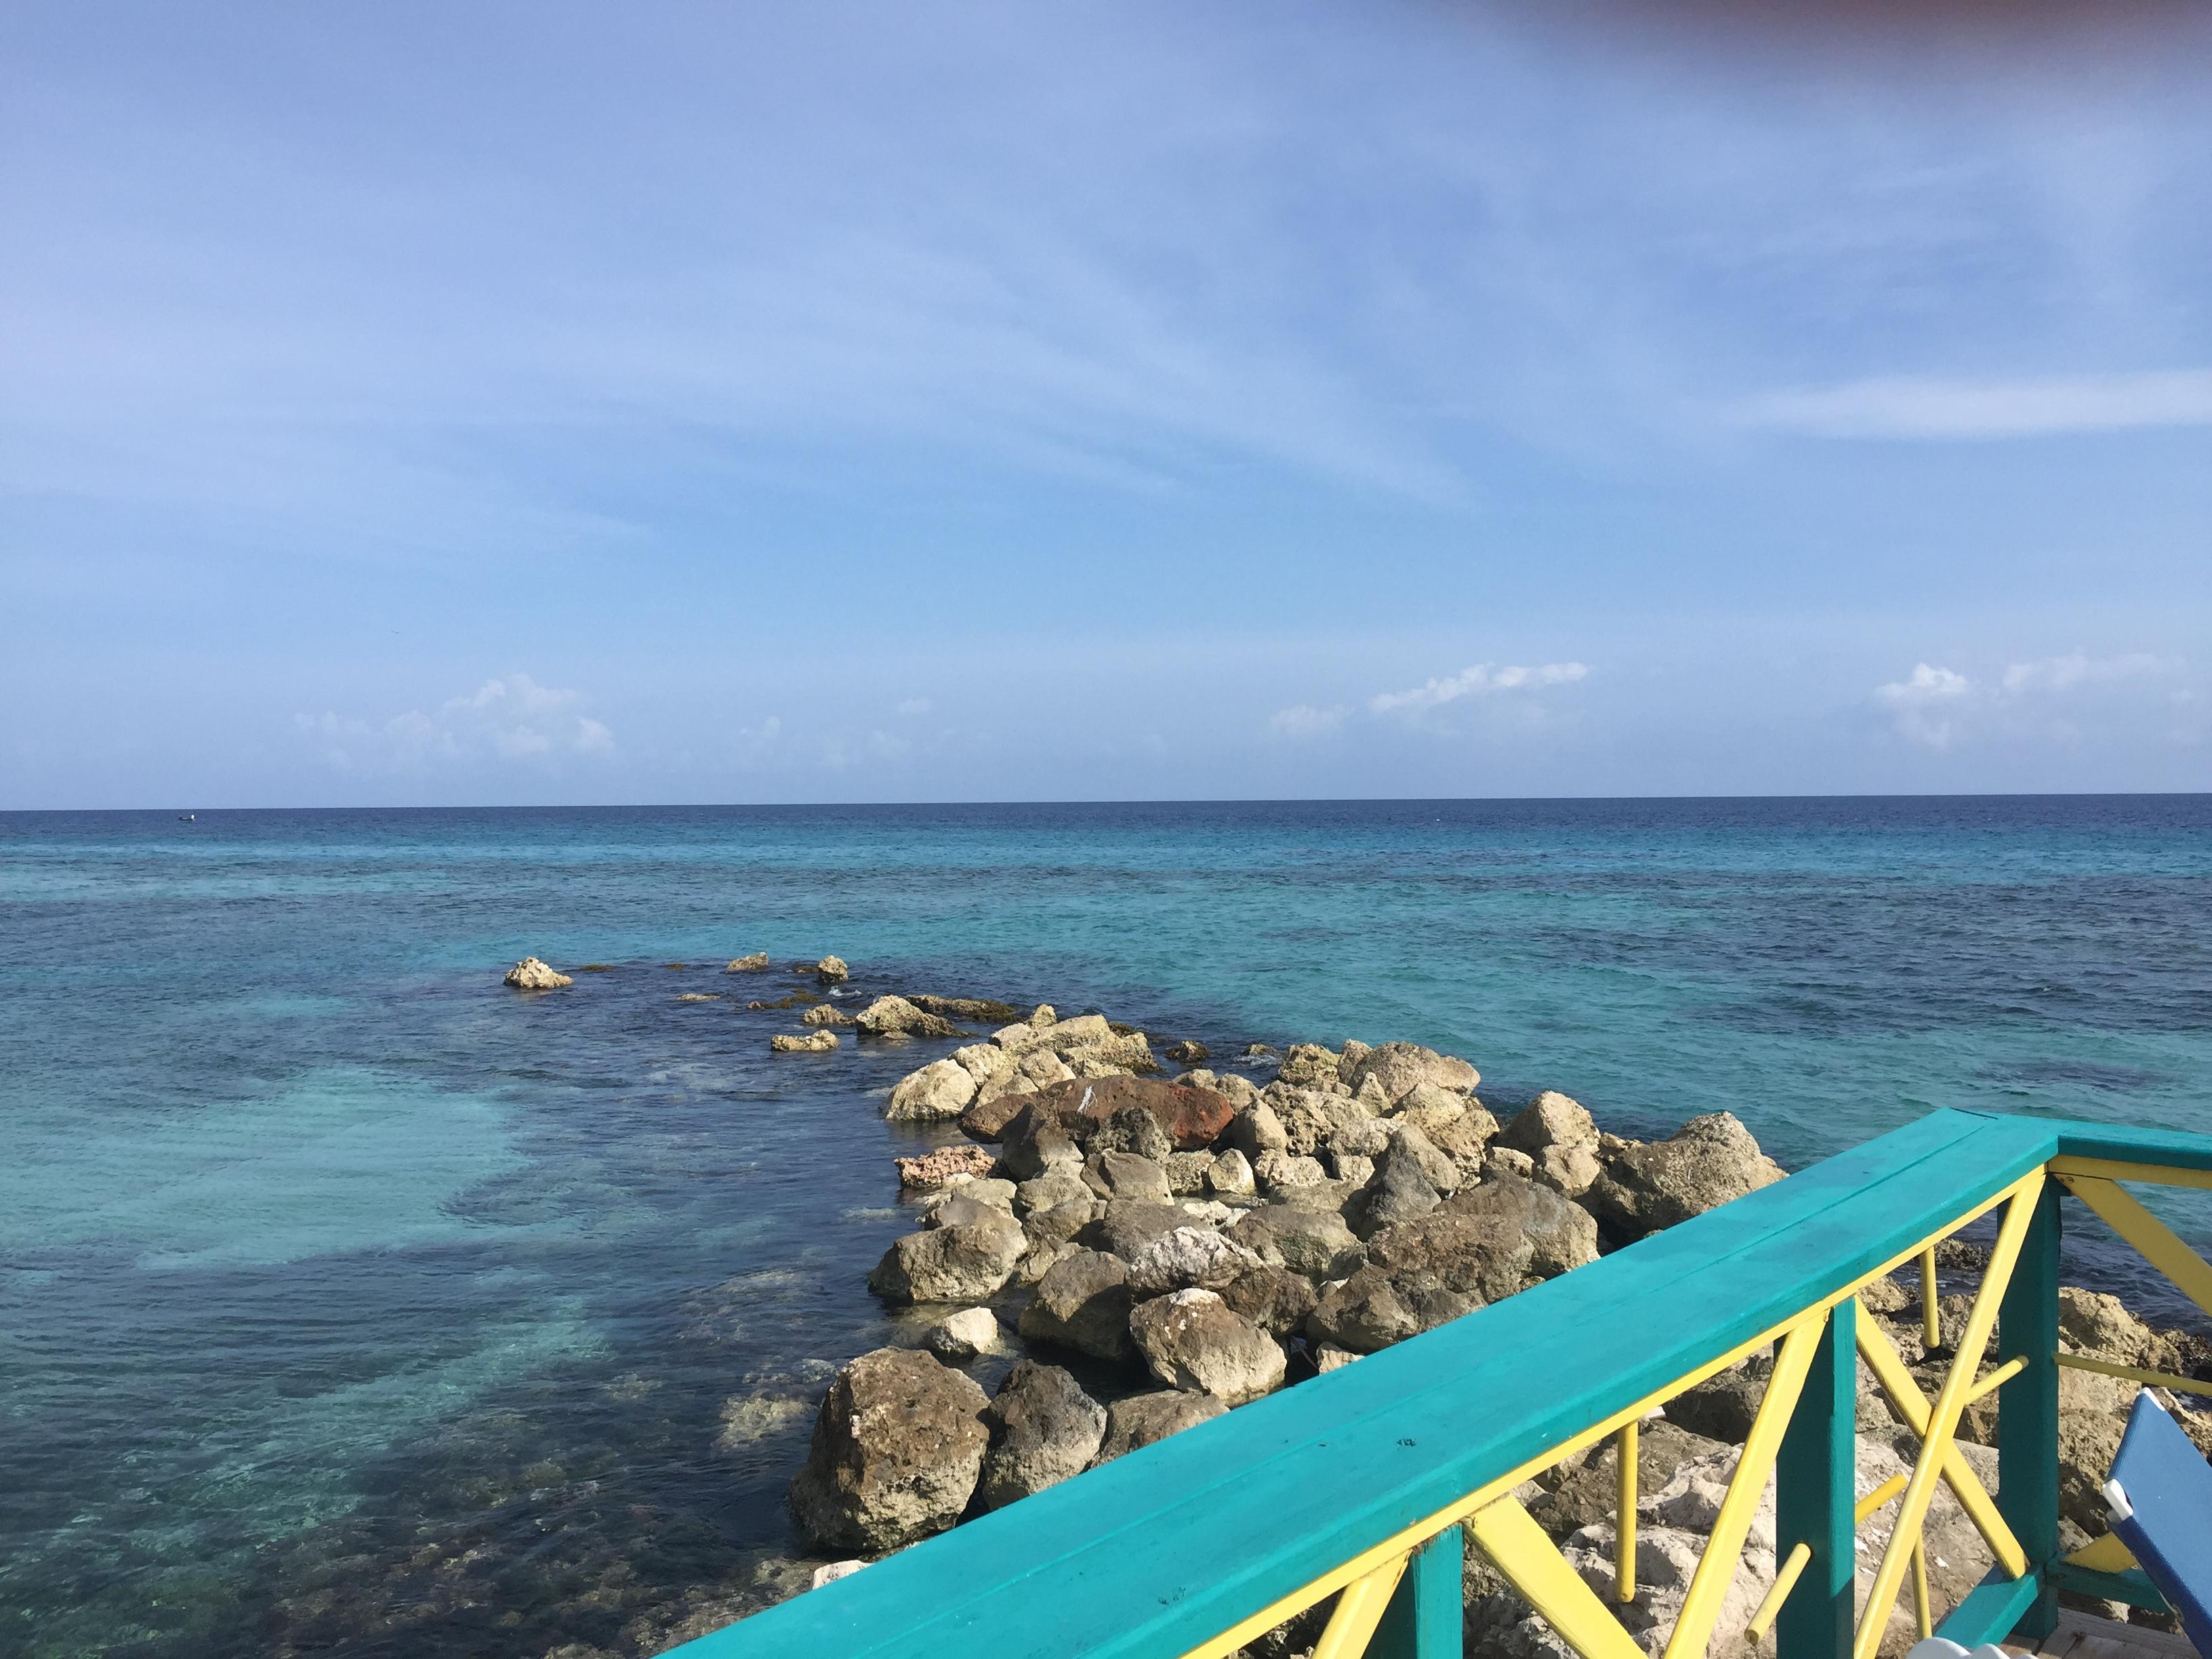 Fabulous snorkeling spot